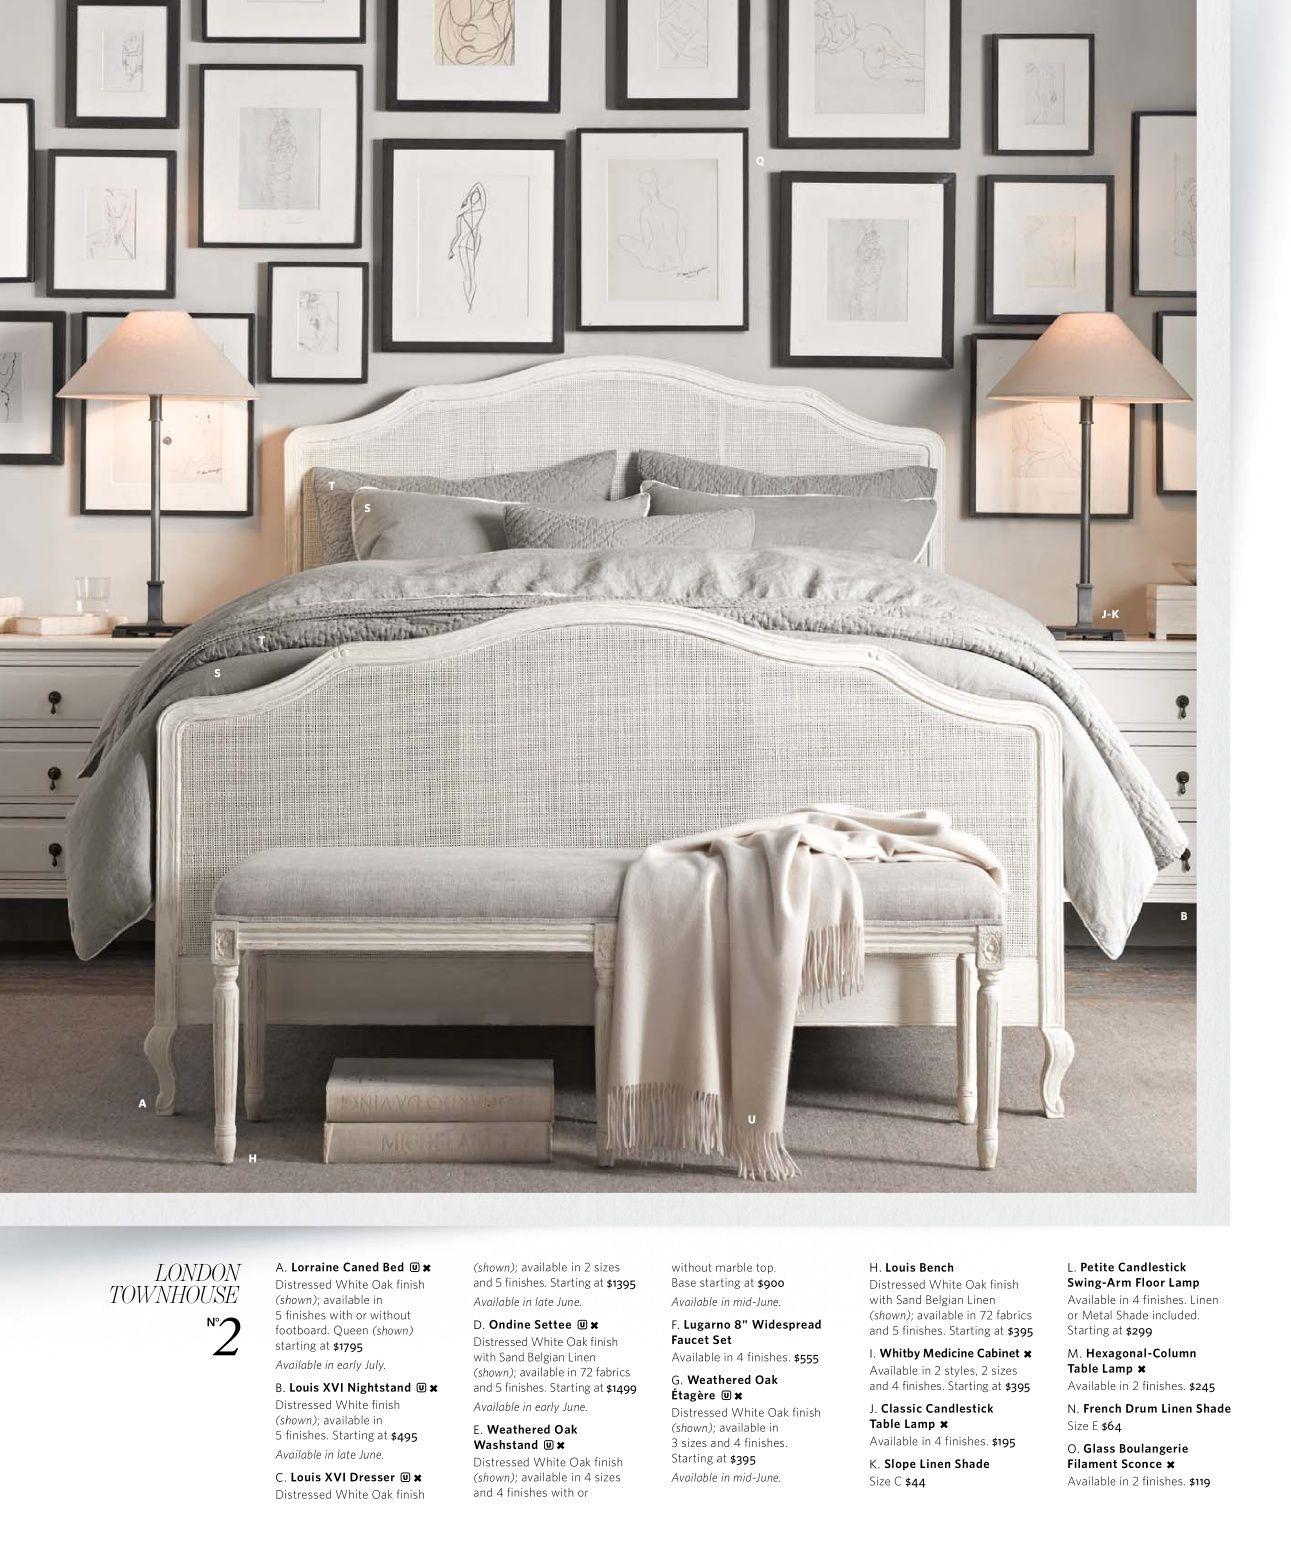 4 room master bedroom design  Beautiful bedroom design idea  Sanctuary  Pinterest